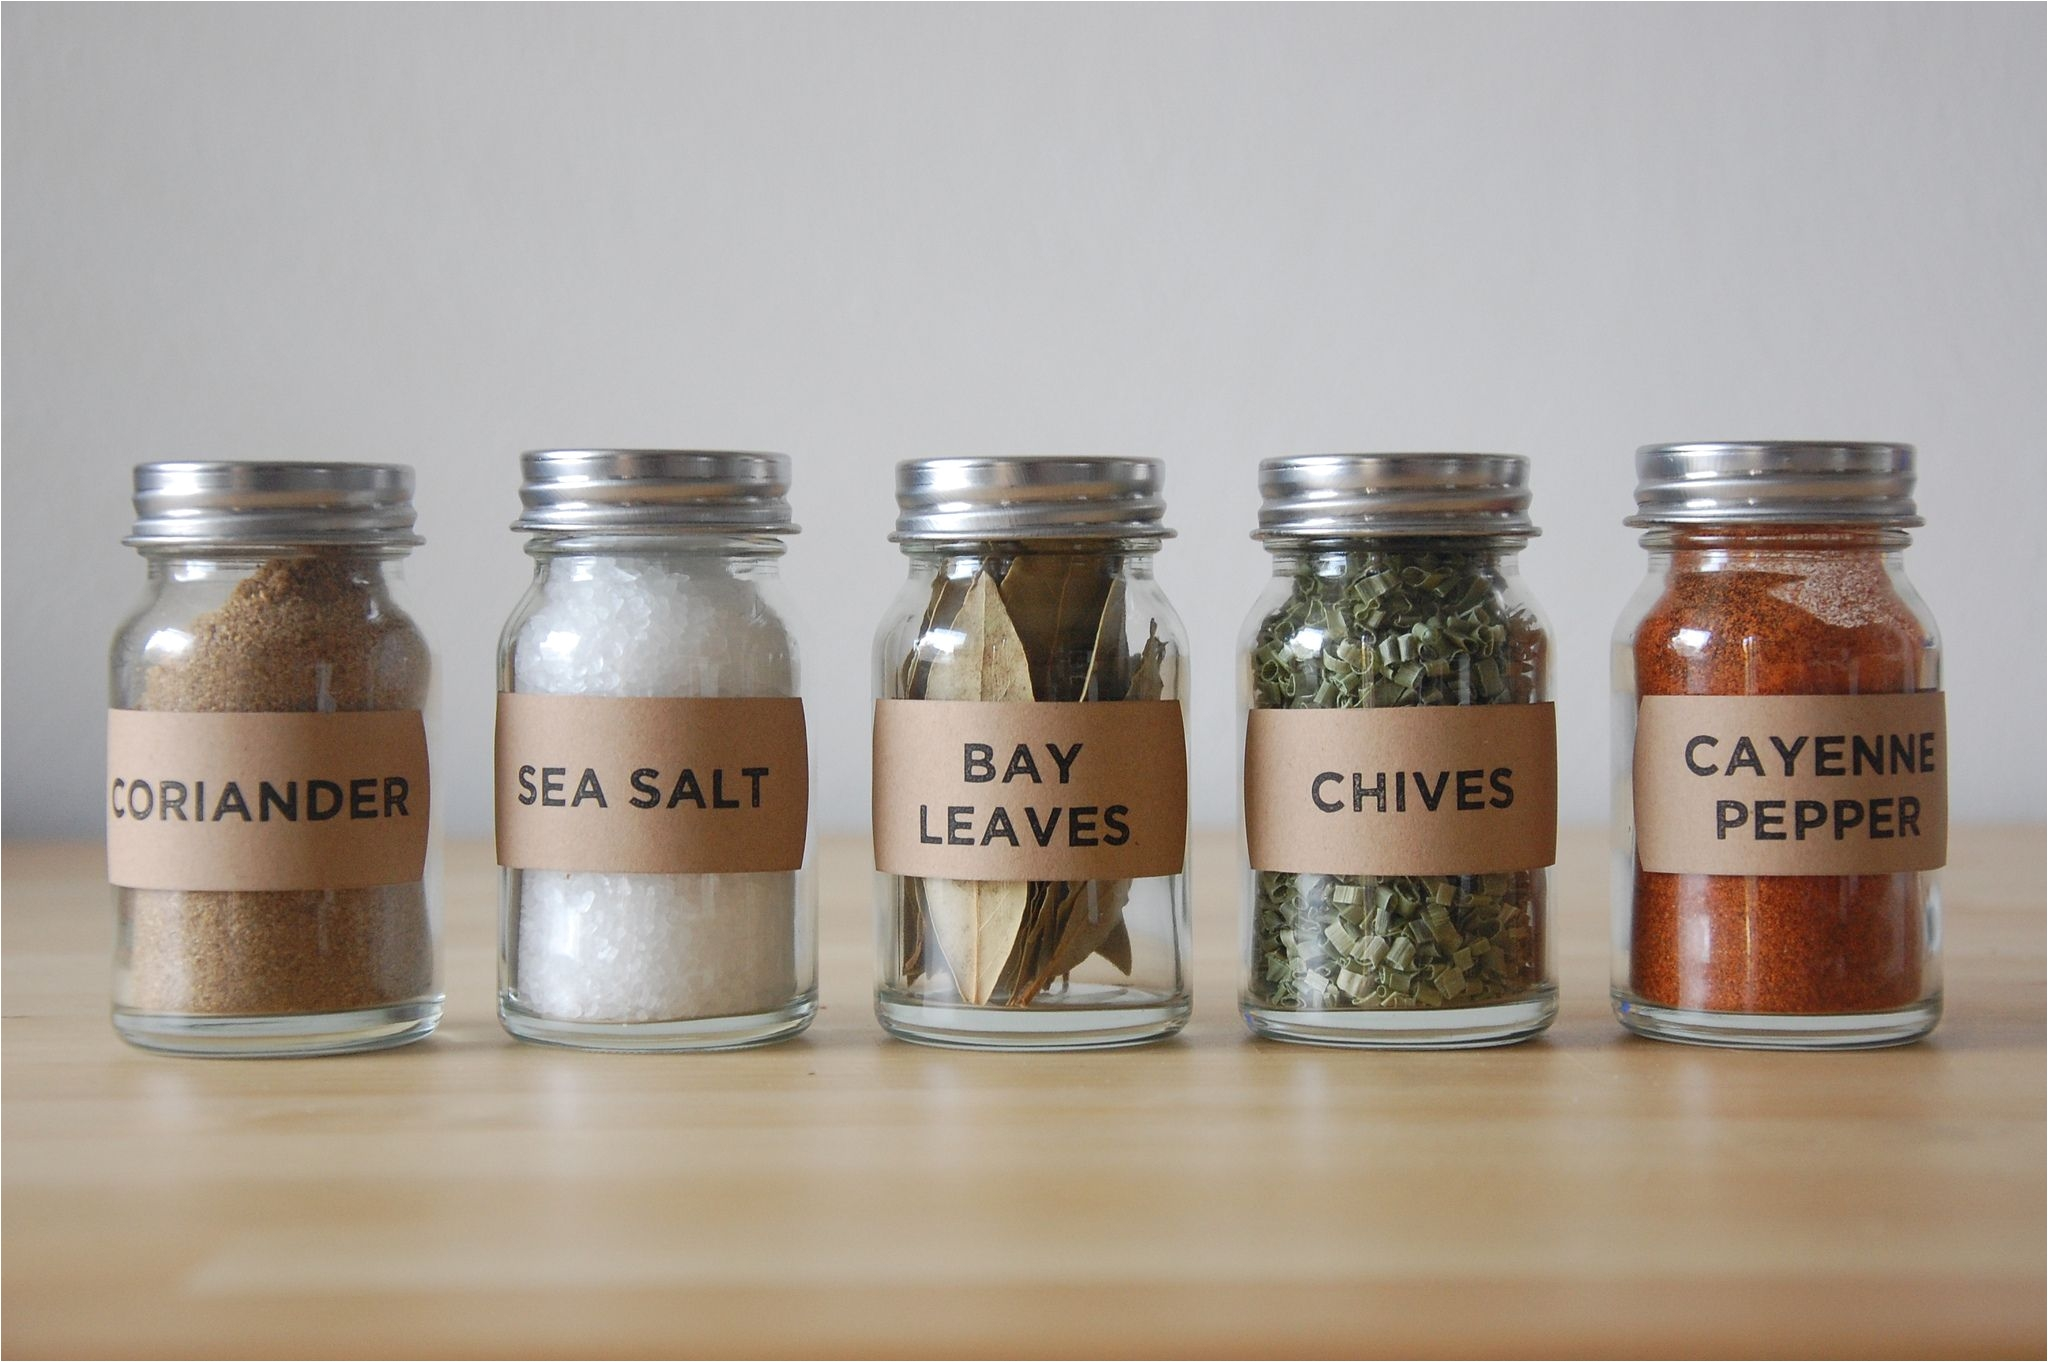 http wellitsokay com 2012 11 simple diy spice jars html